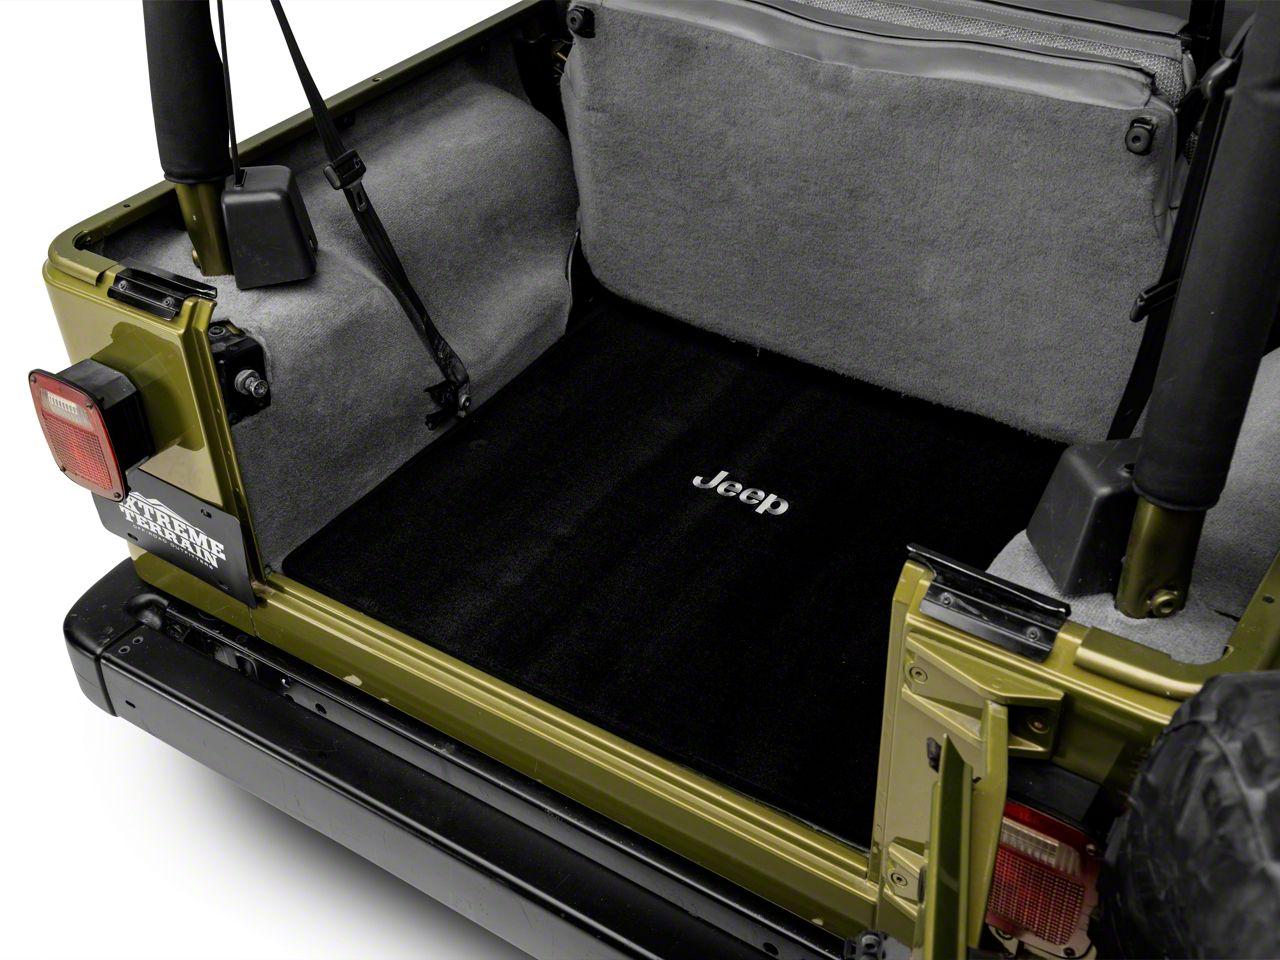 Lloyd Ultimat Black Cargo Mat - Jeep Logo (97-06 Jeep Wrangler TJ)